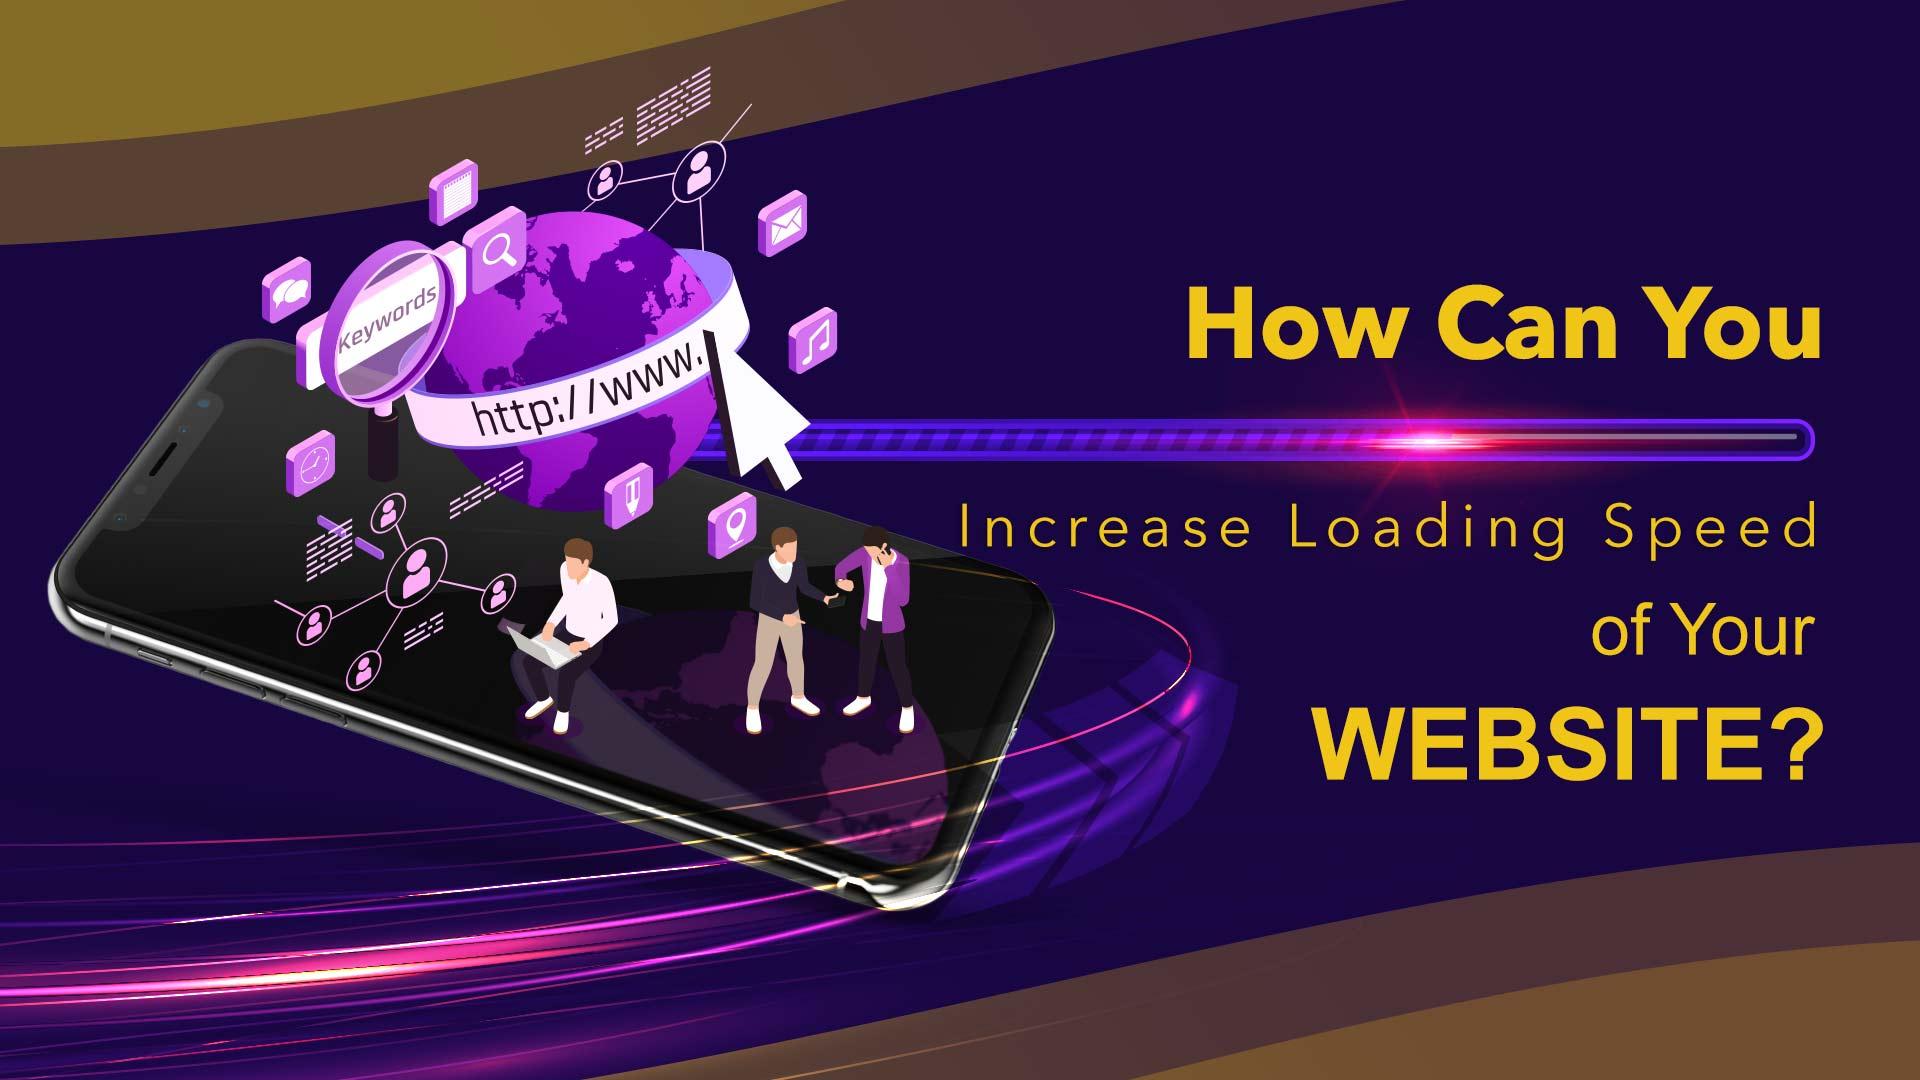 Increase-Loading-Speed-Website